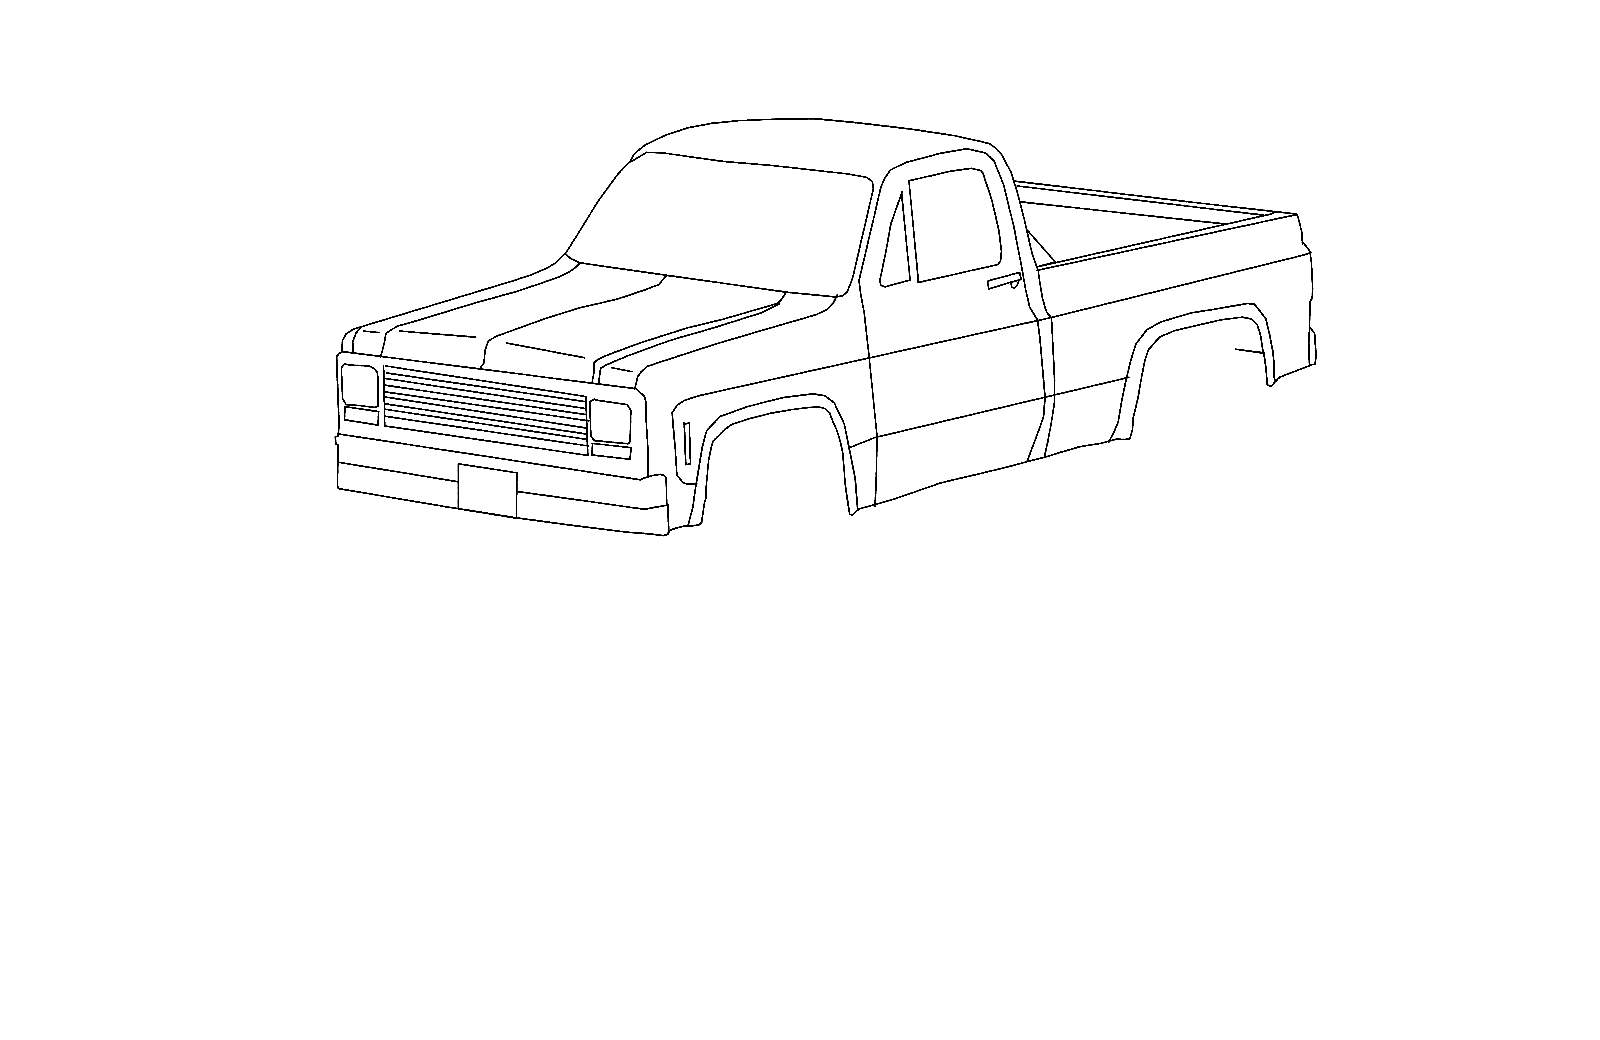 Chevy S10 Truck